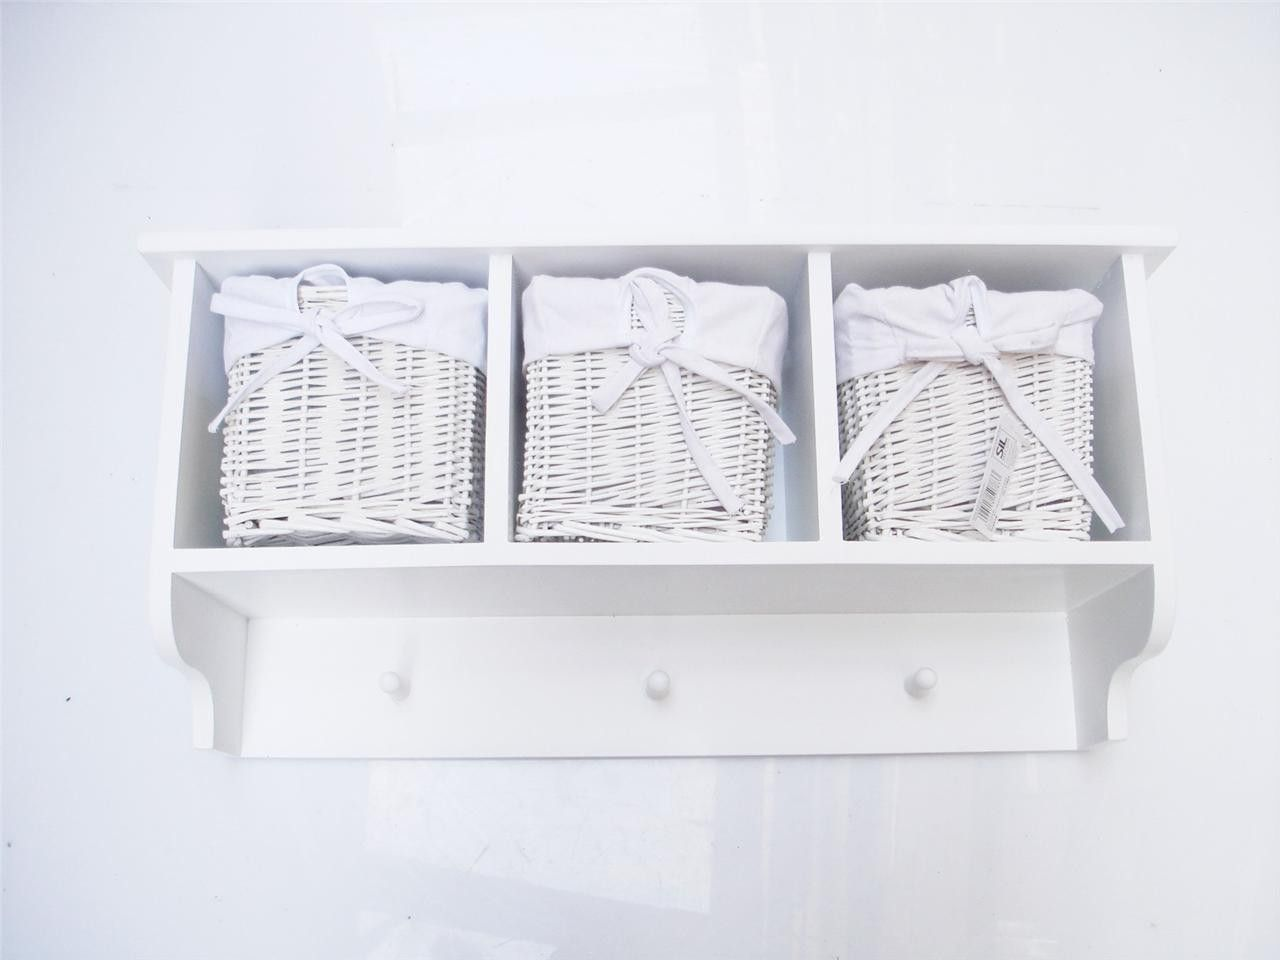 Hallway key storage  White Shabby Chic Hallway Shelf With  or  Basket Hooks Key Coat